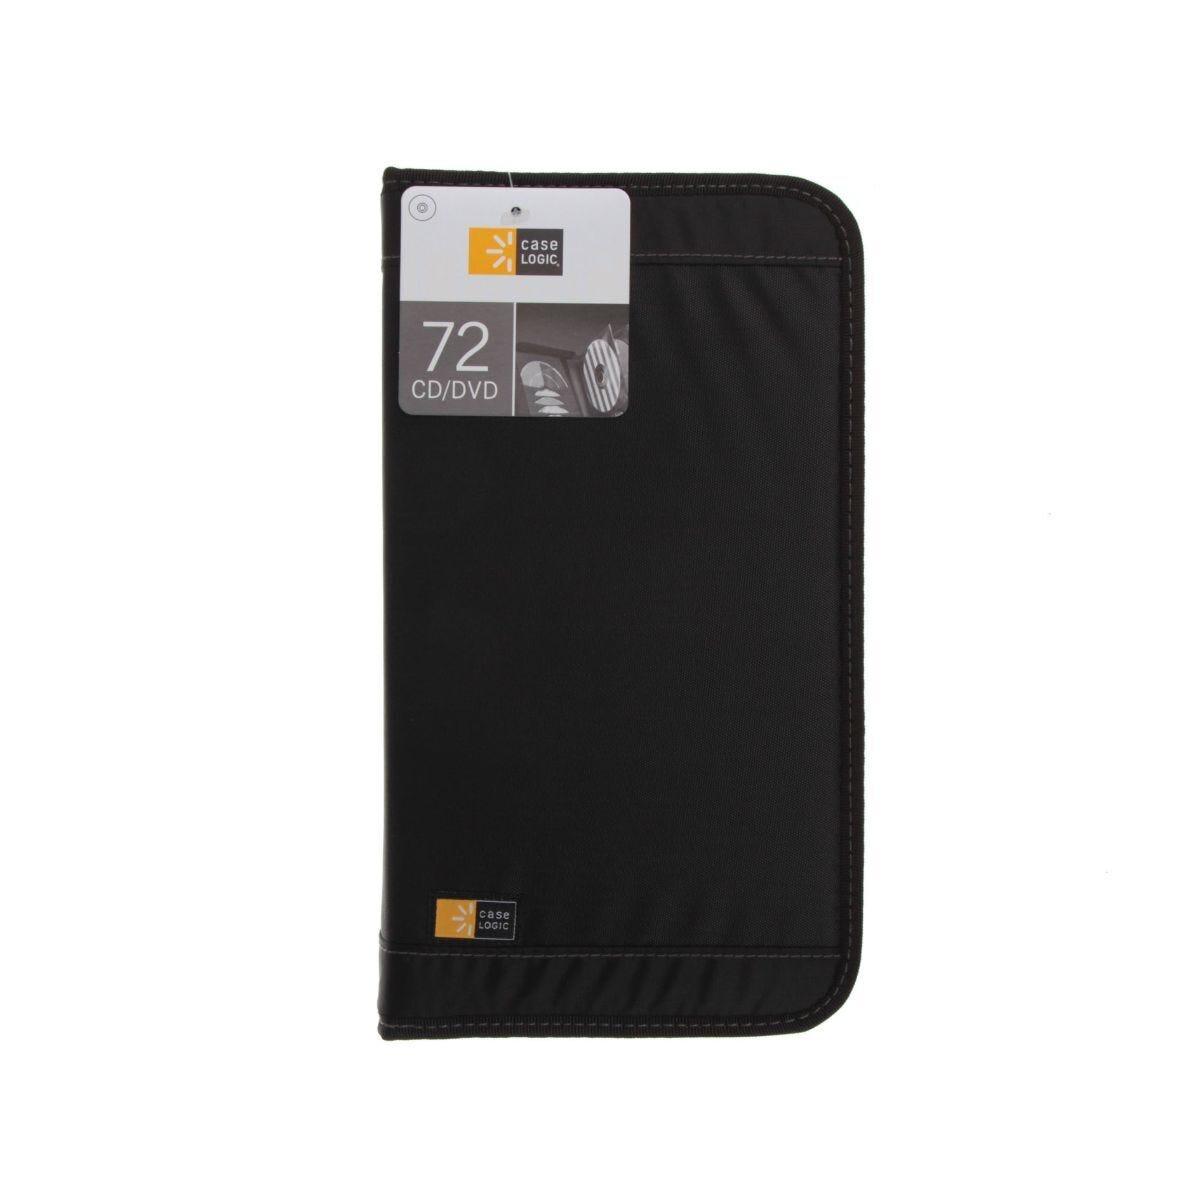 Case logic 72 Capacity CD Wallet